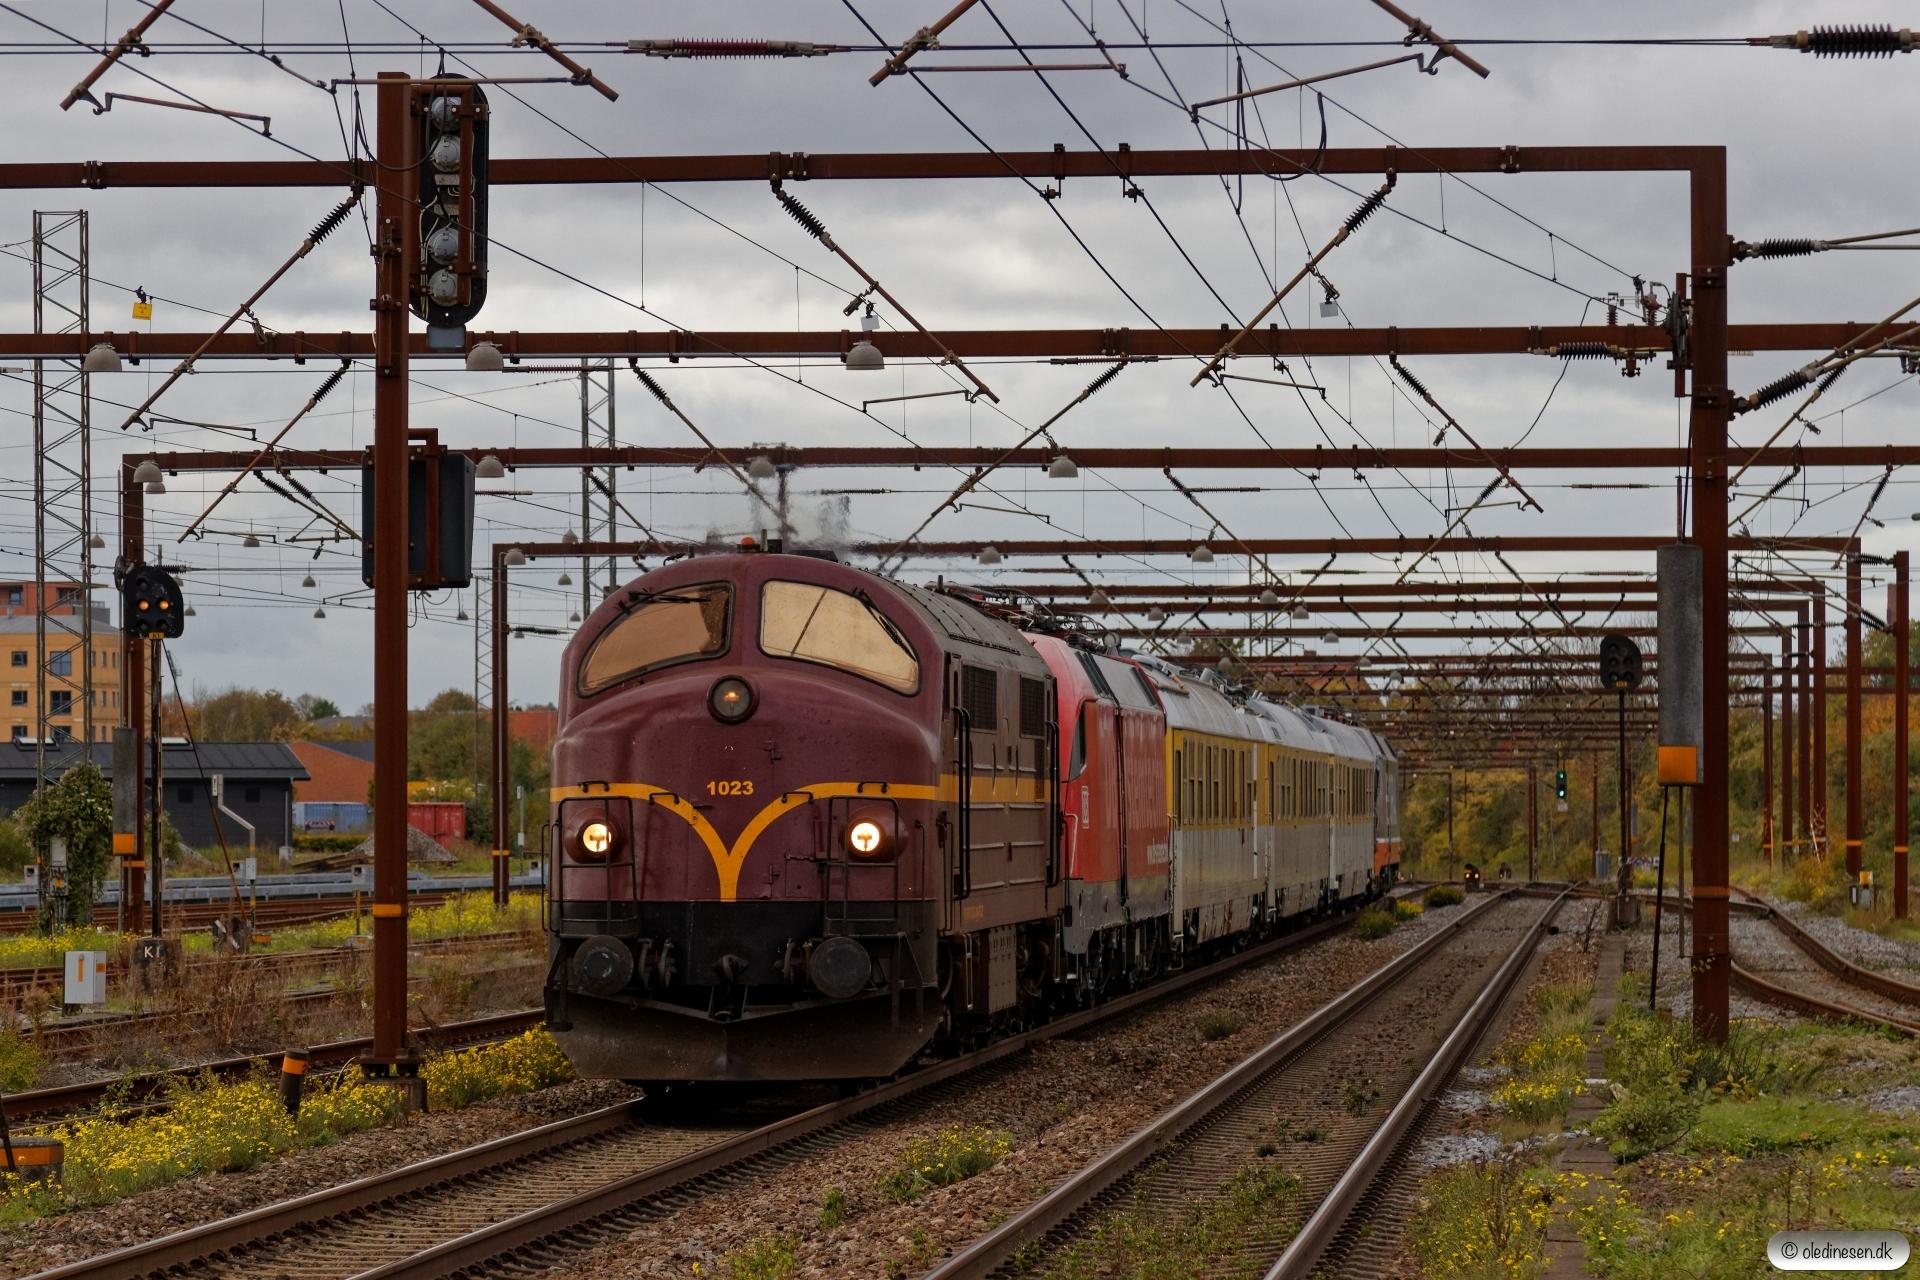 CFLCD MX 1023+DB 182 506+3 målevogne+HCTOR 242.502 som CB 6070 Pa-Rg. Odense 19.10.2018.